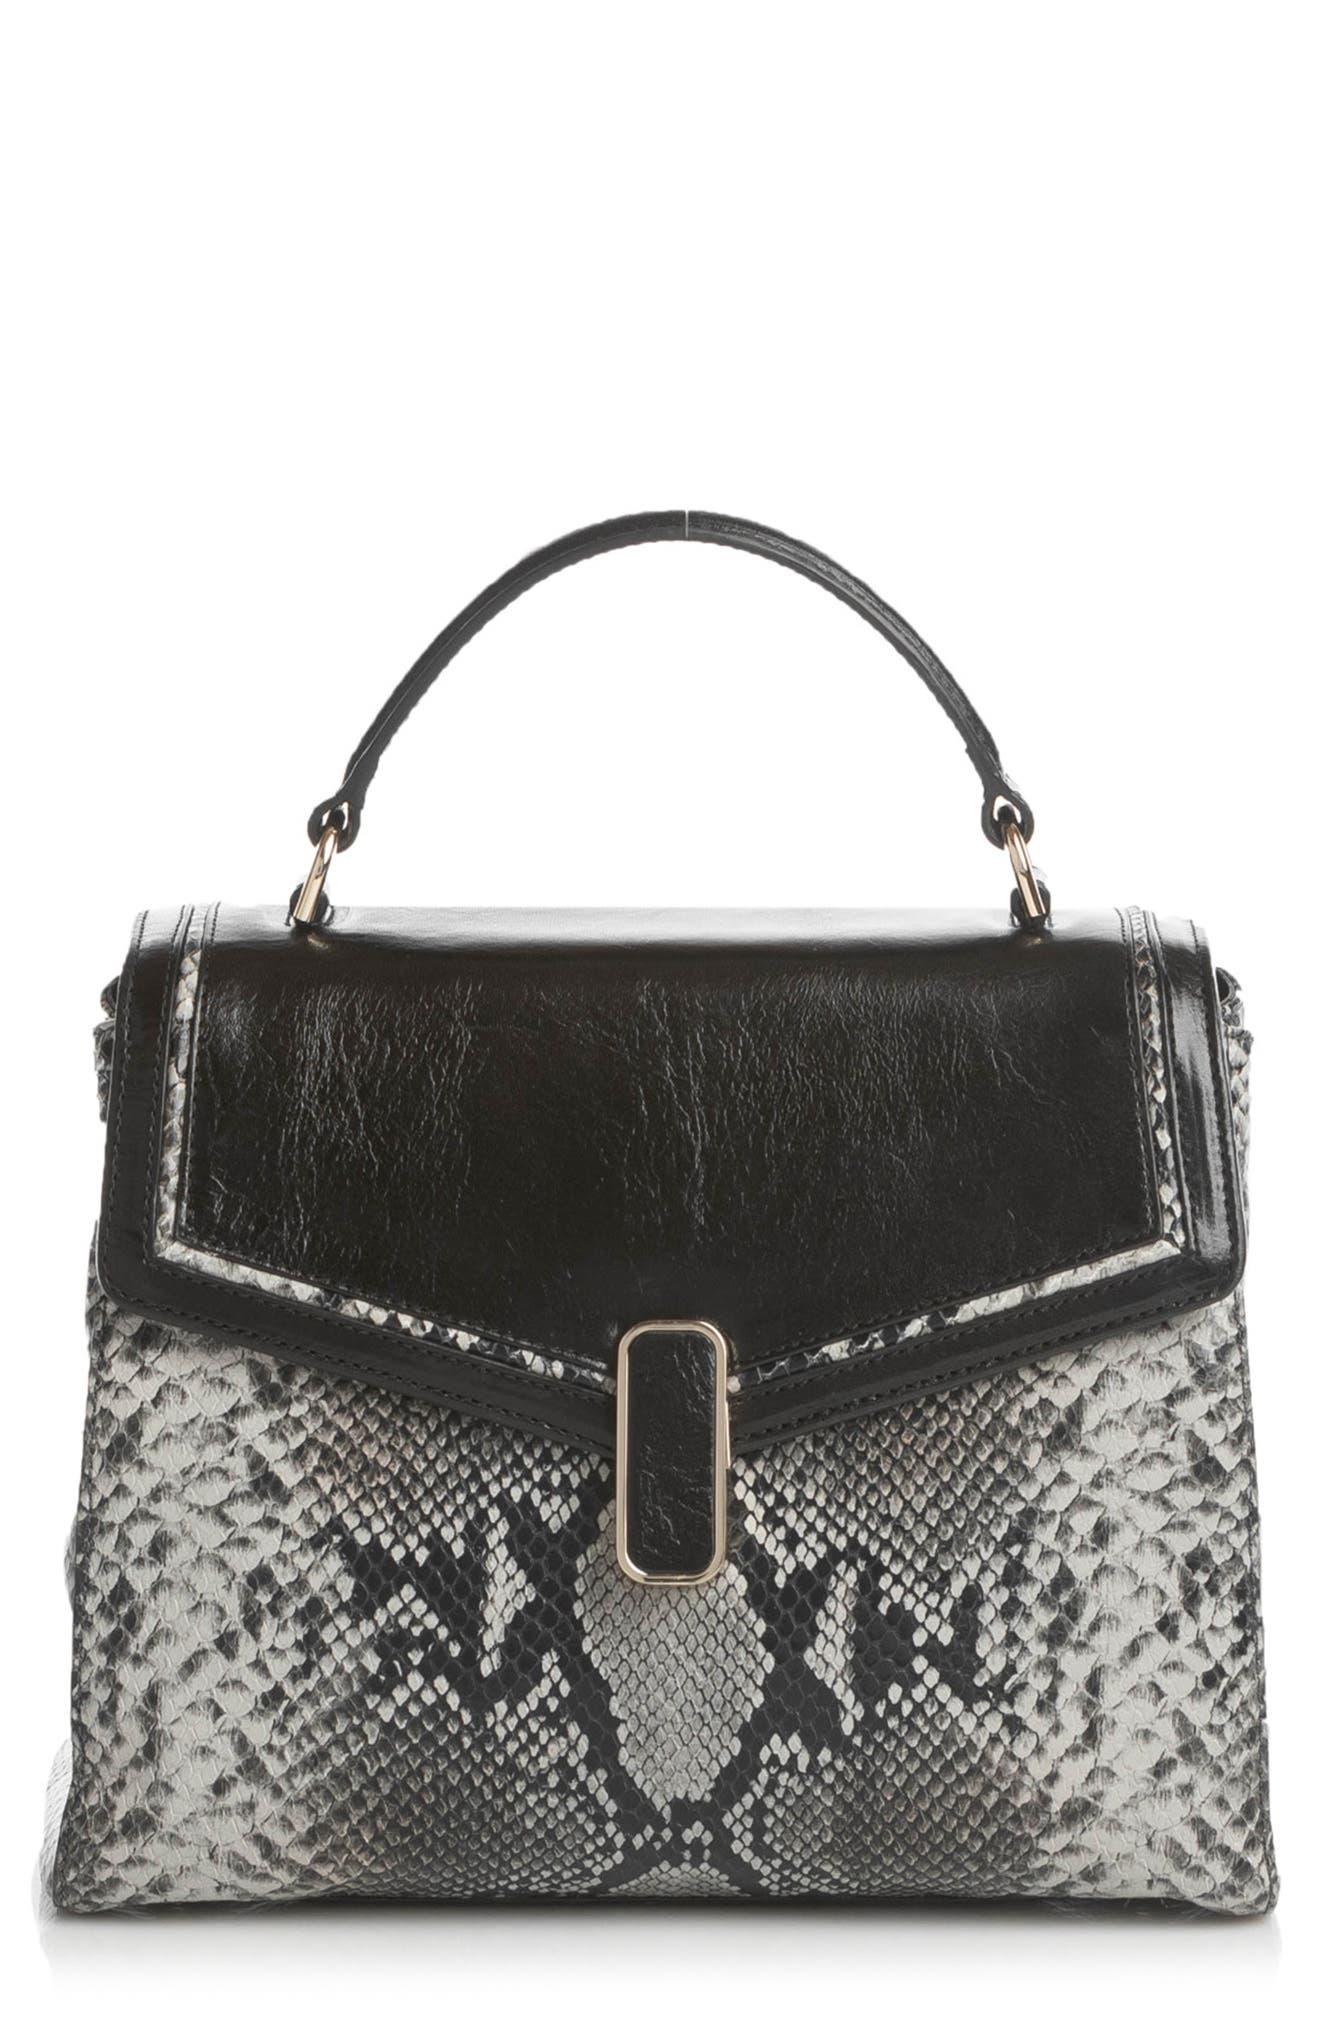 Rene Leather Top Handle Bag